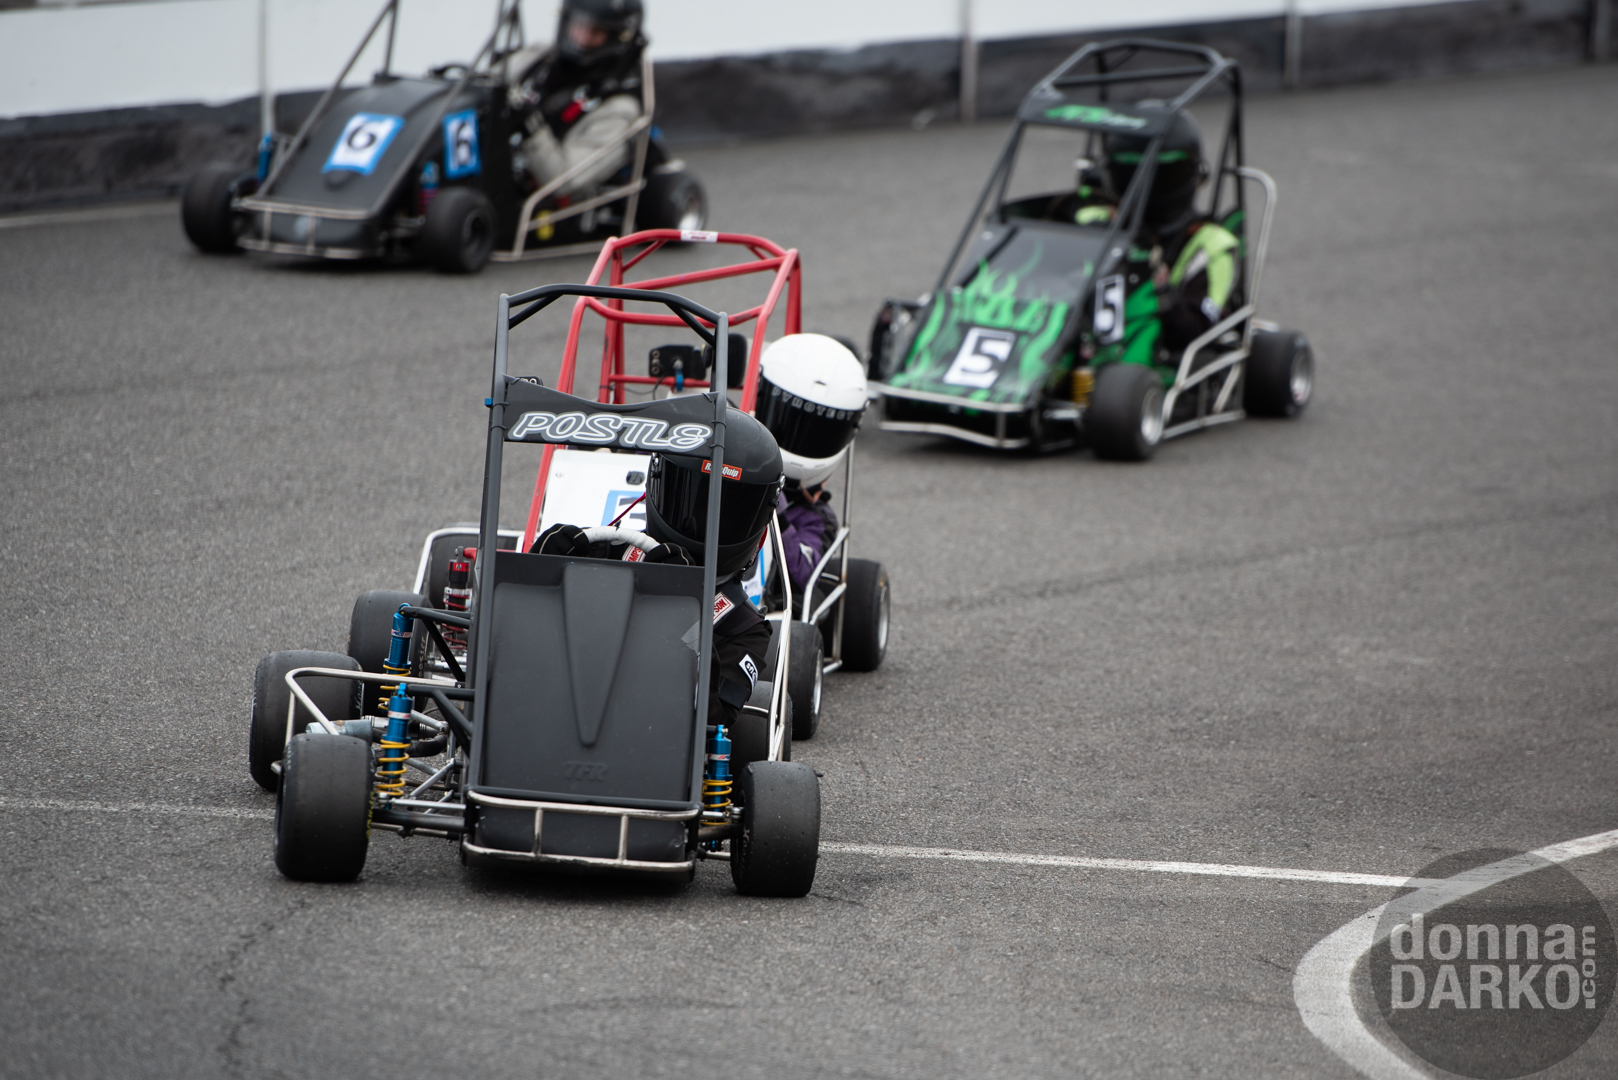 QWMA (Racing) 8-11-2019 DSC_6594.jpg